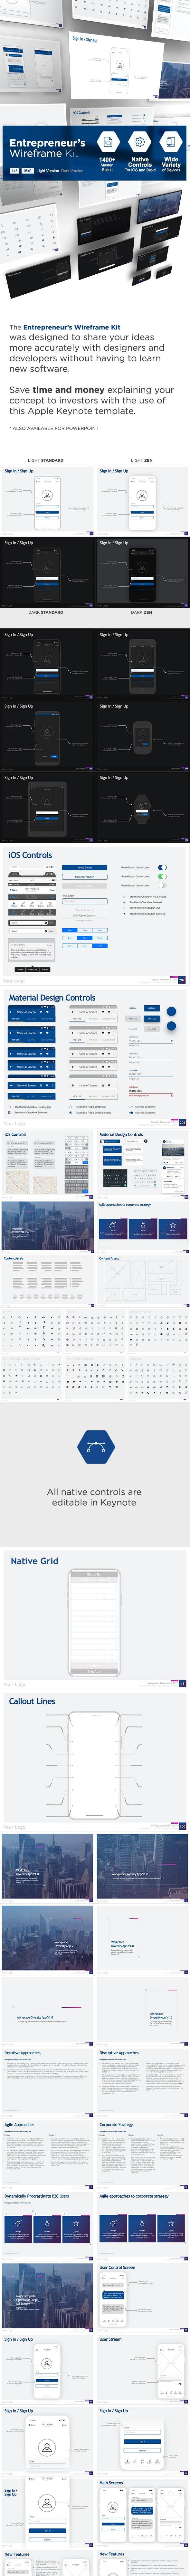 The Entrepreneur's Wireframe Kit - Keynote Version - Business Keynote Templates